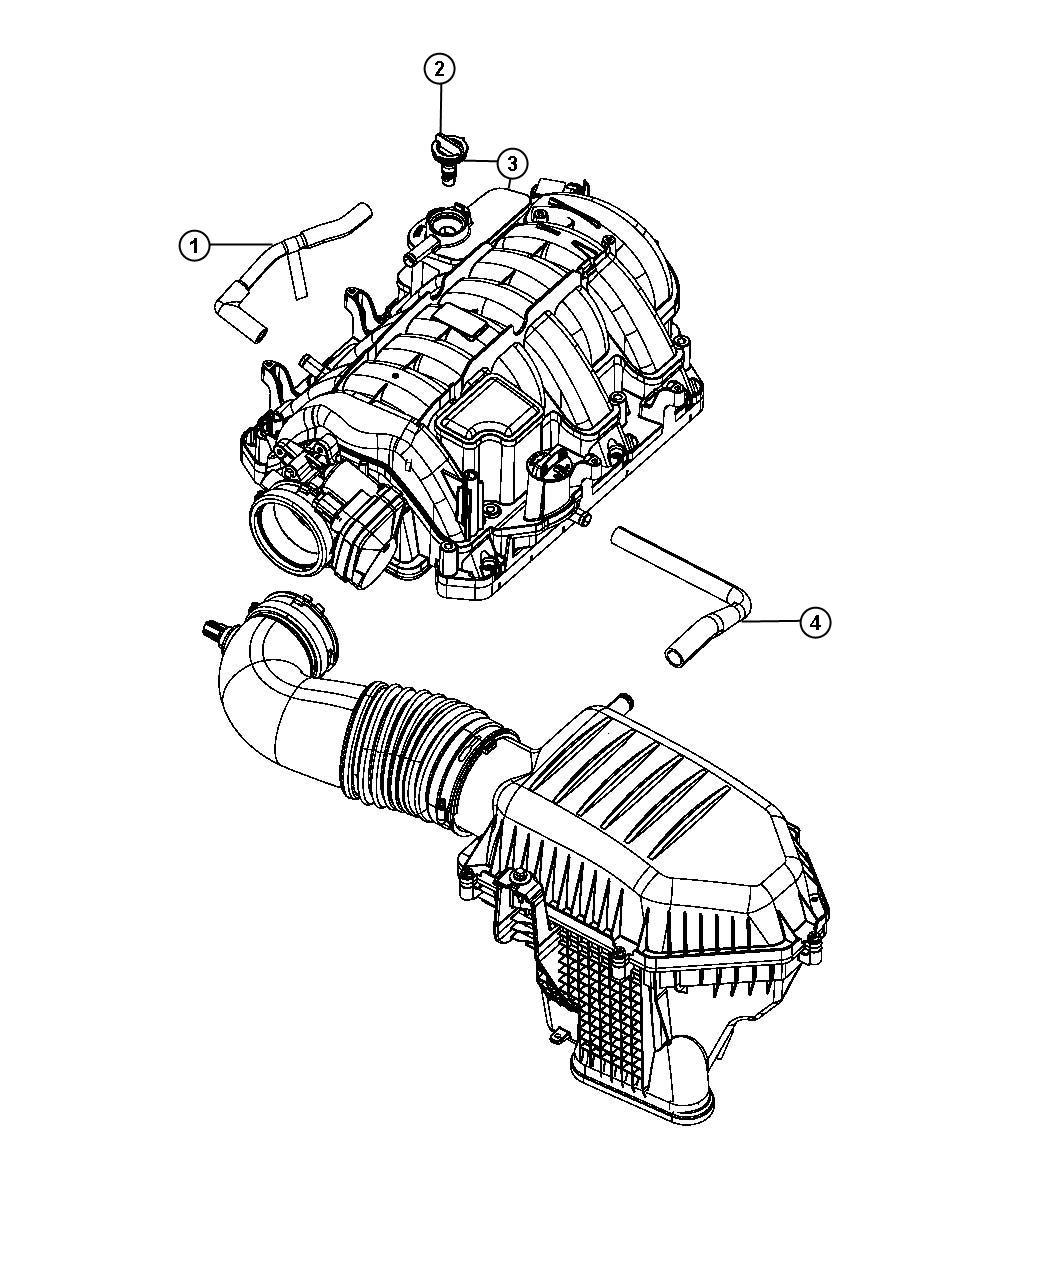 Dodge Charger Hose  Pcv Valve To Intake Manifold